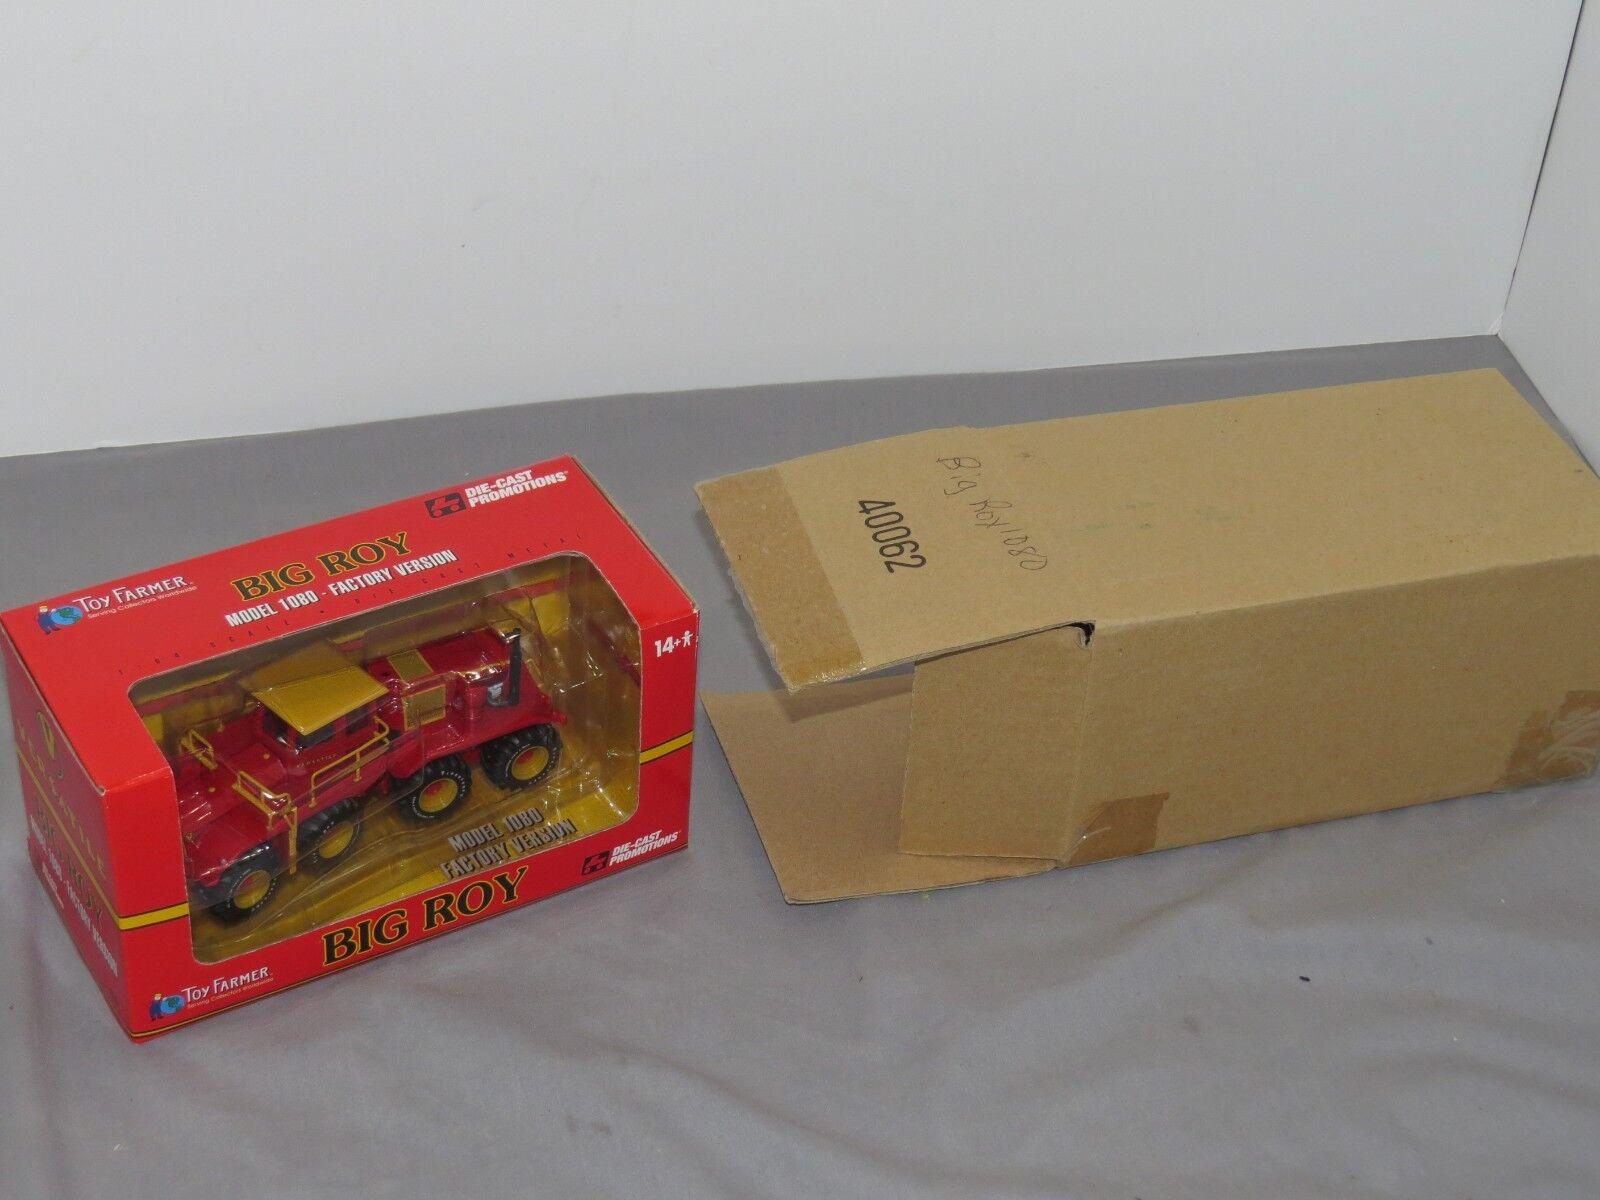 RARE  1 64 Versatile Big Roy 1080 Tractor Factory Version DCP NIB Shipping box